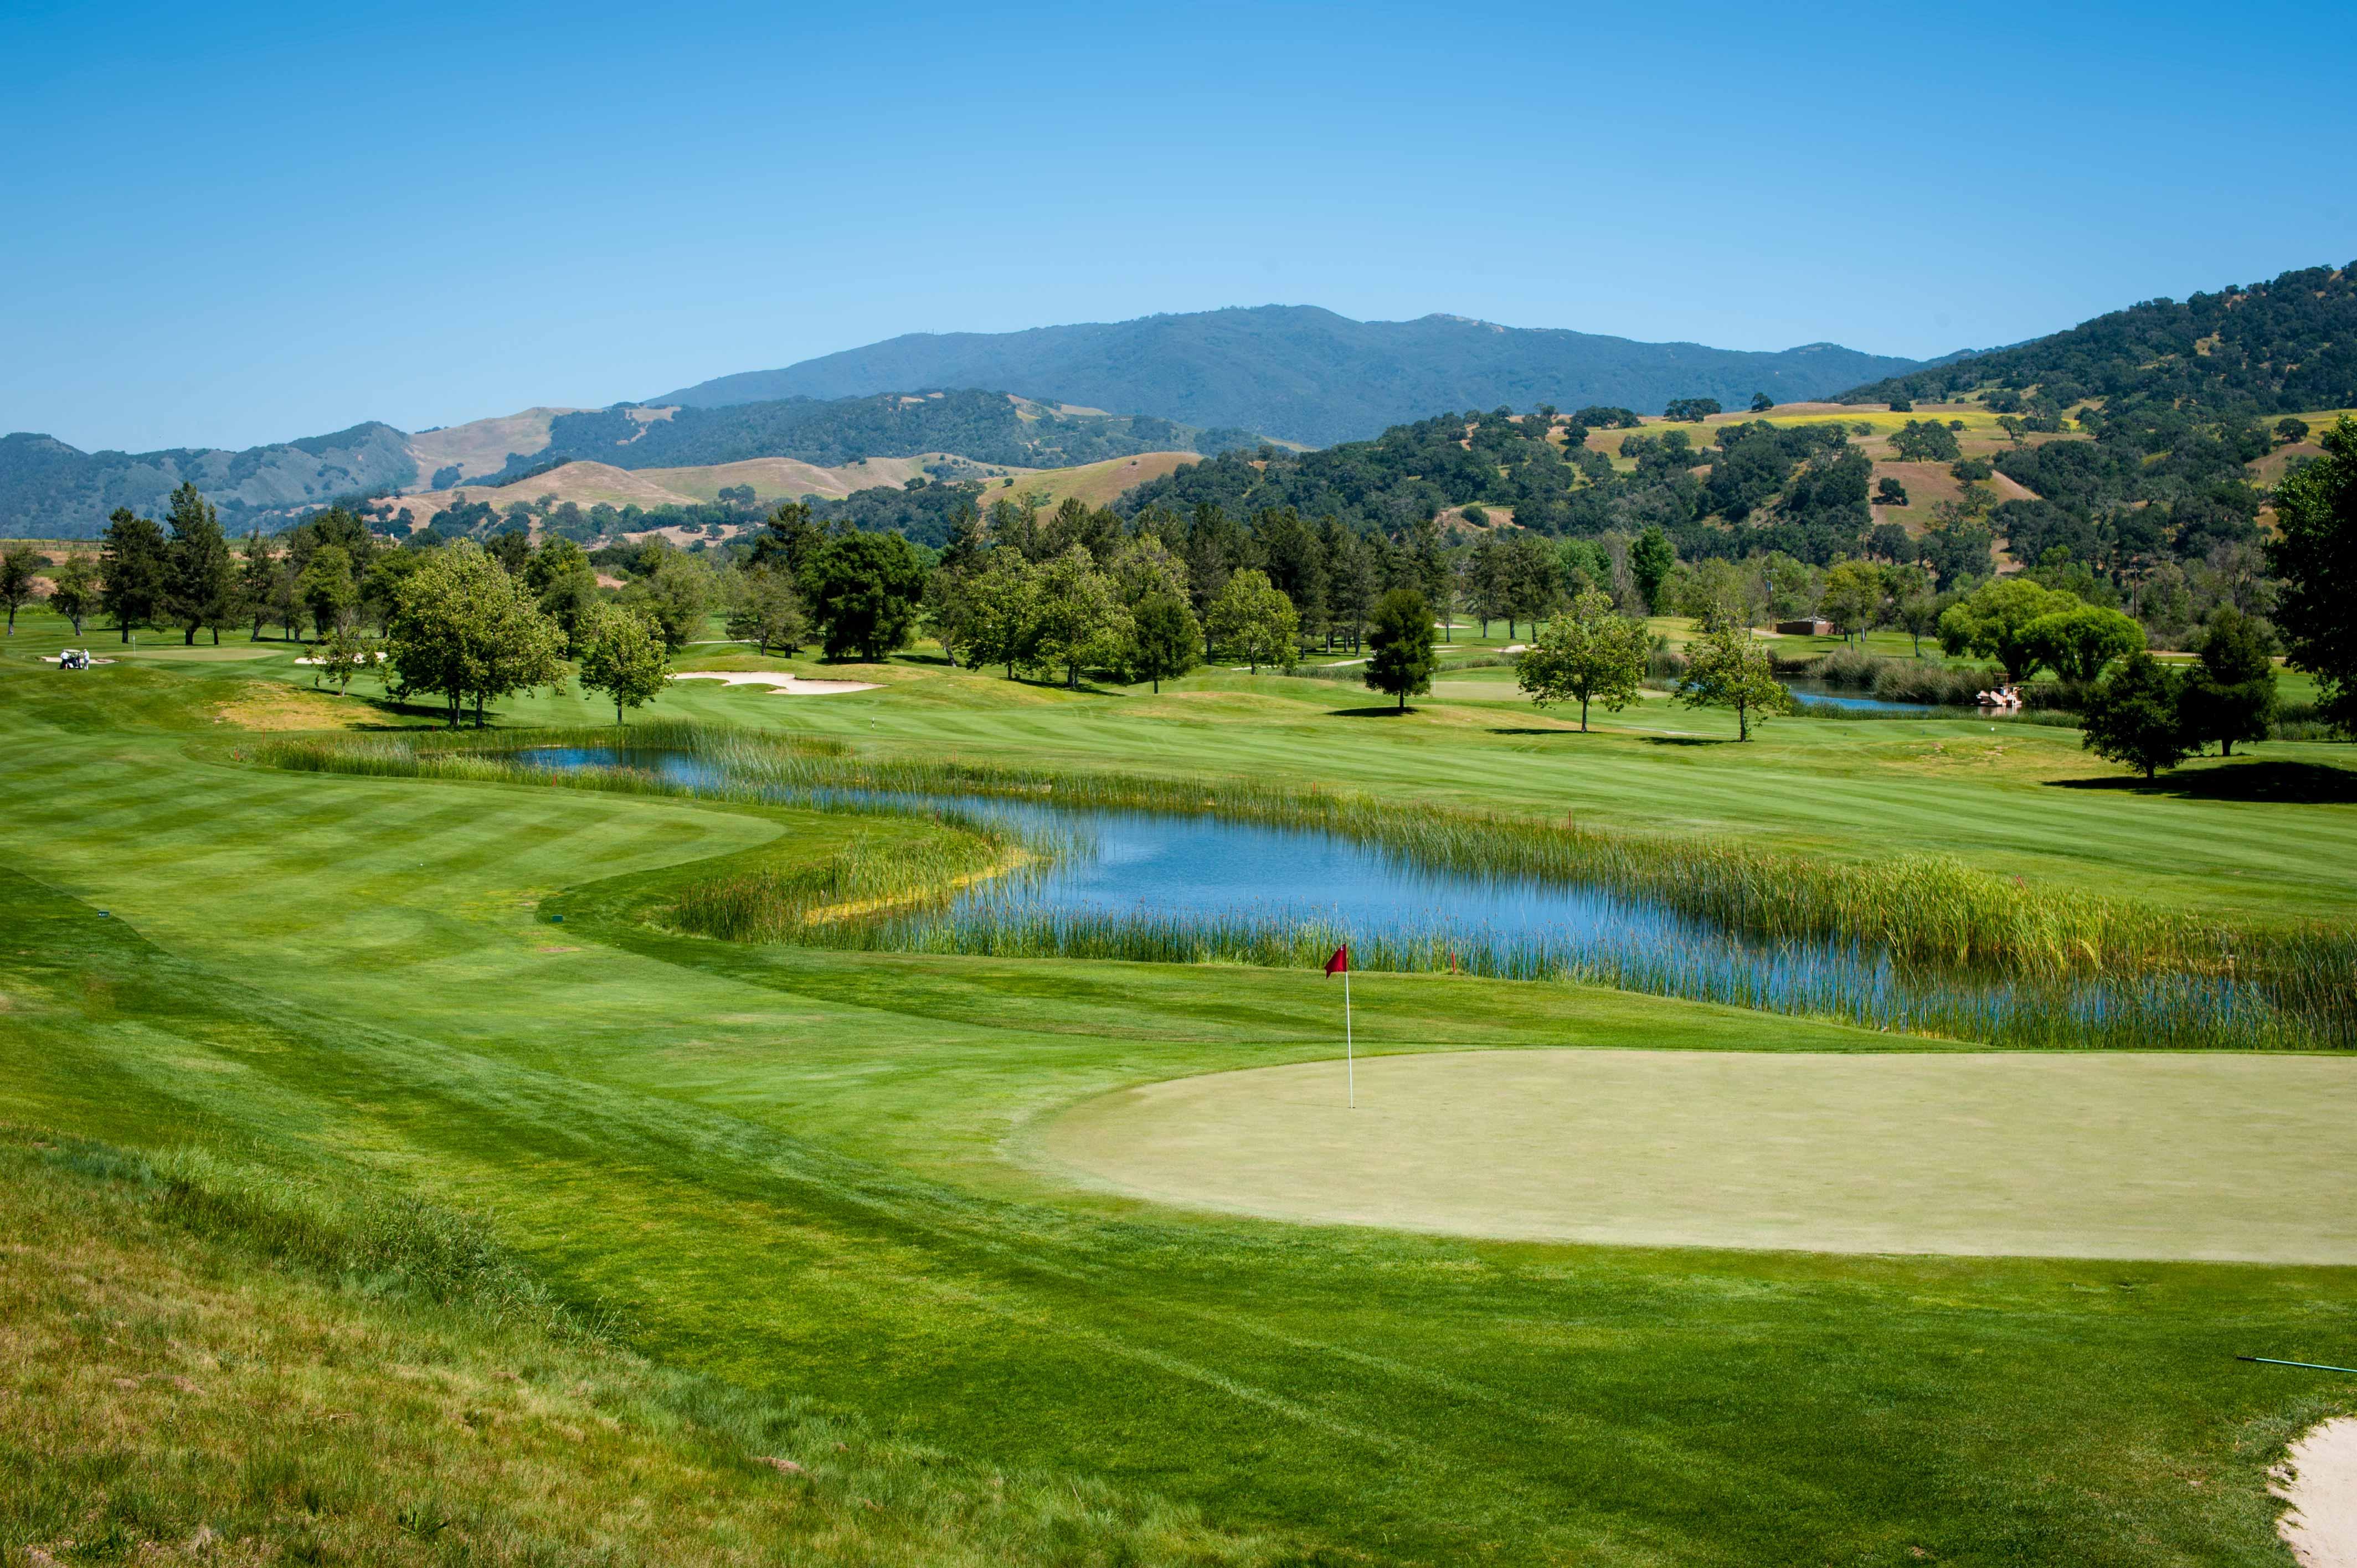 Alisal River Golf Course - Alisal Resort in Solvang California